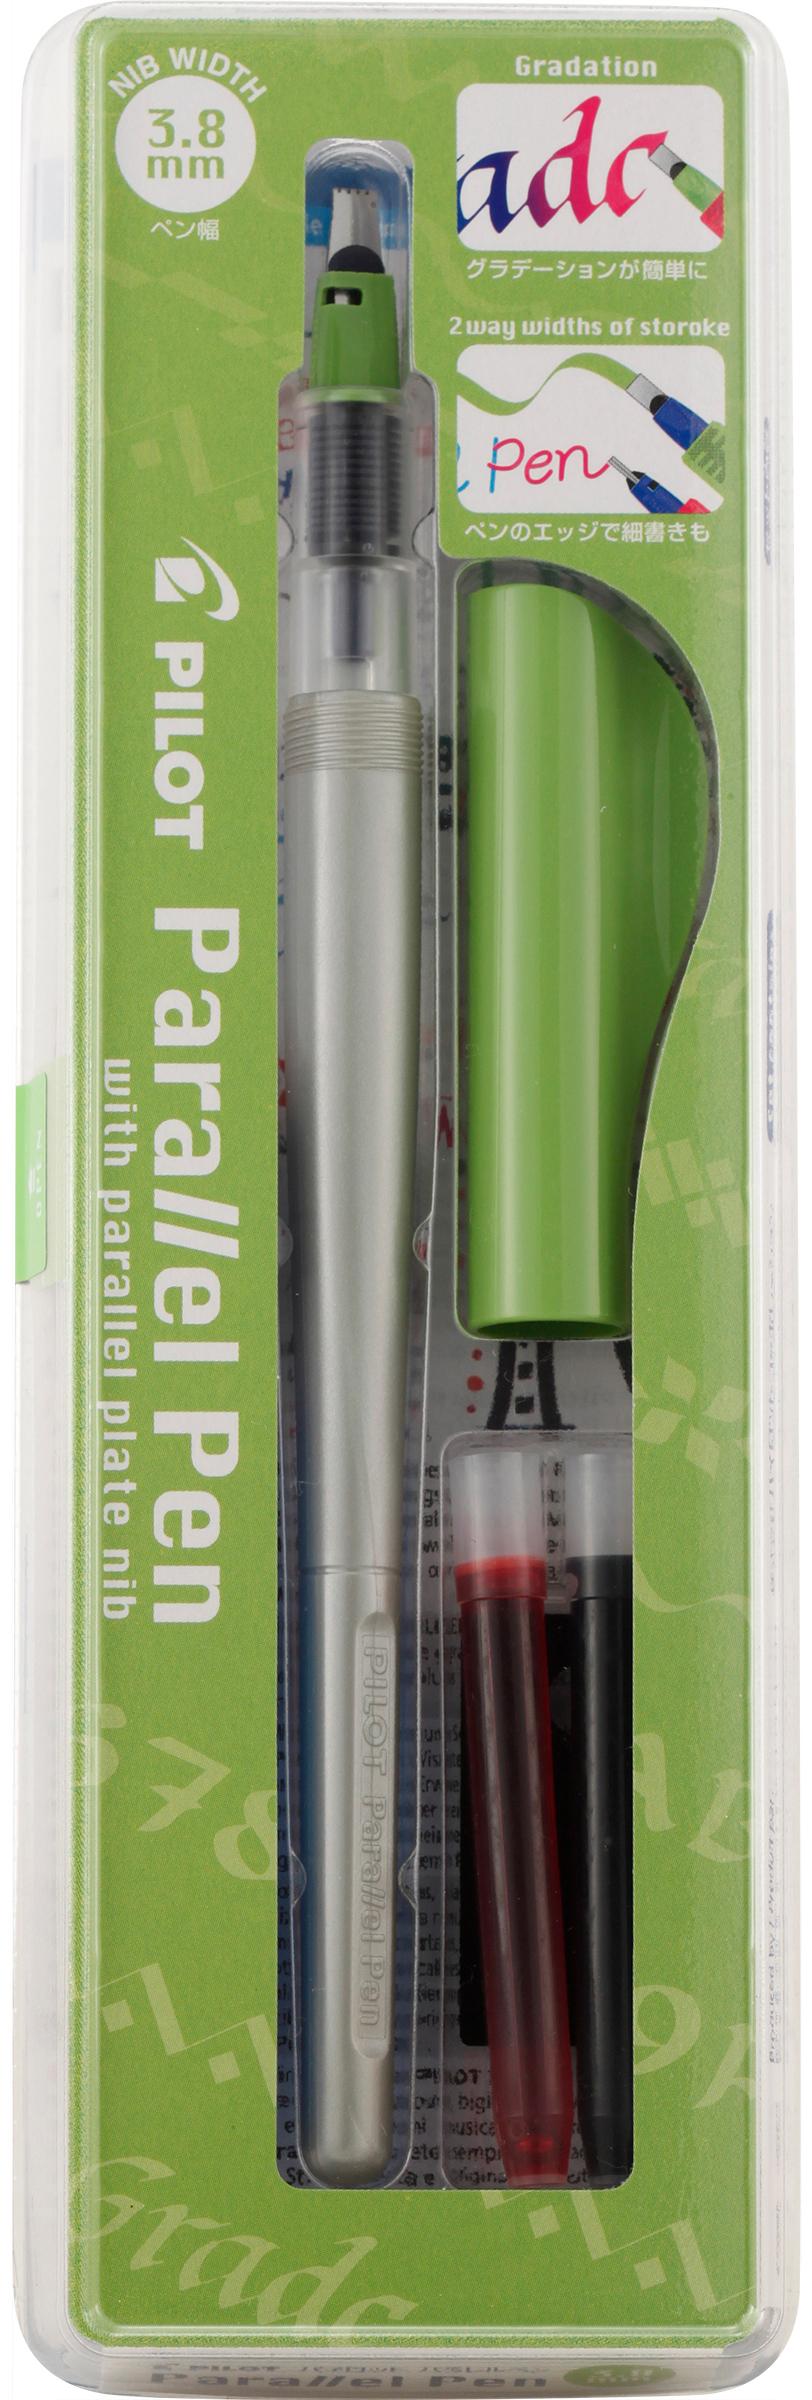 Pilot Parallel Calligraphy Pen Set 3.8mm Nib-Black & Red Ink